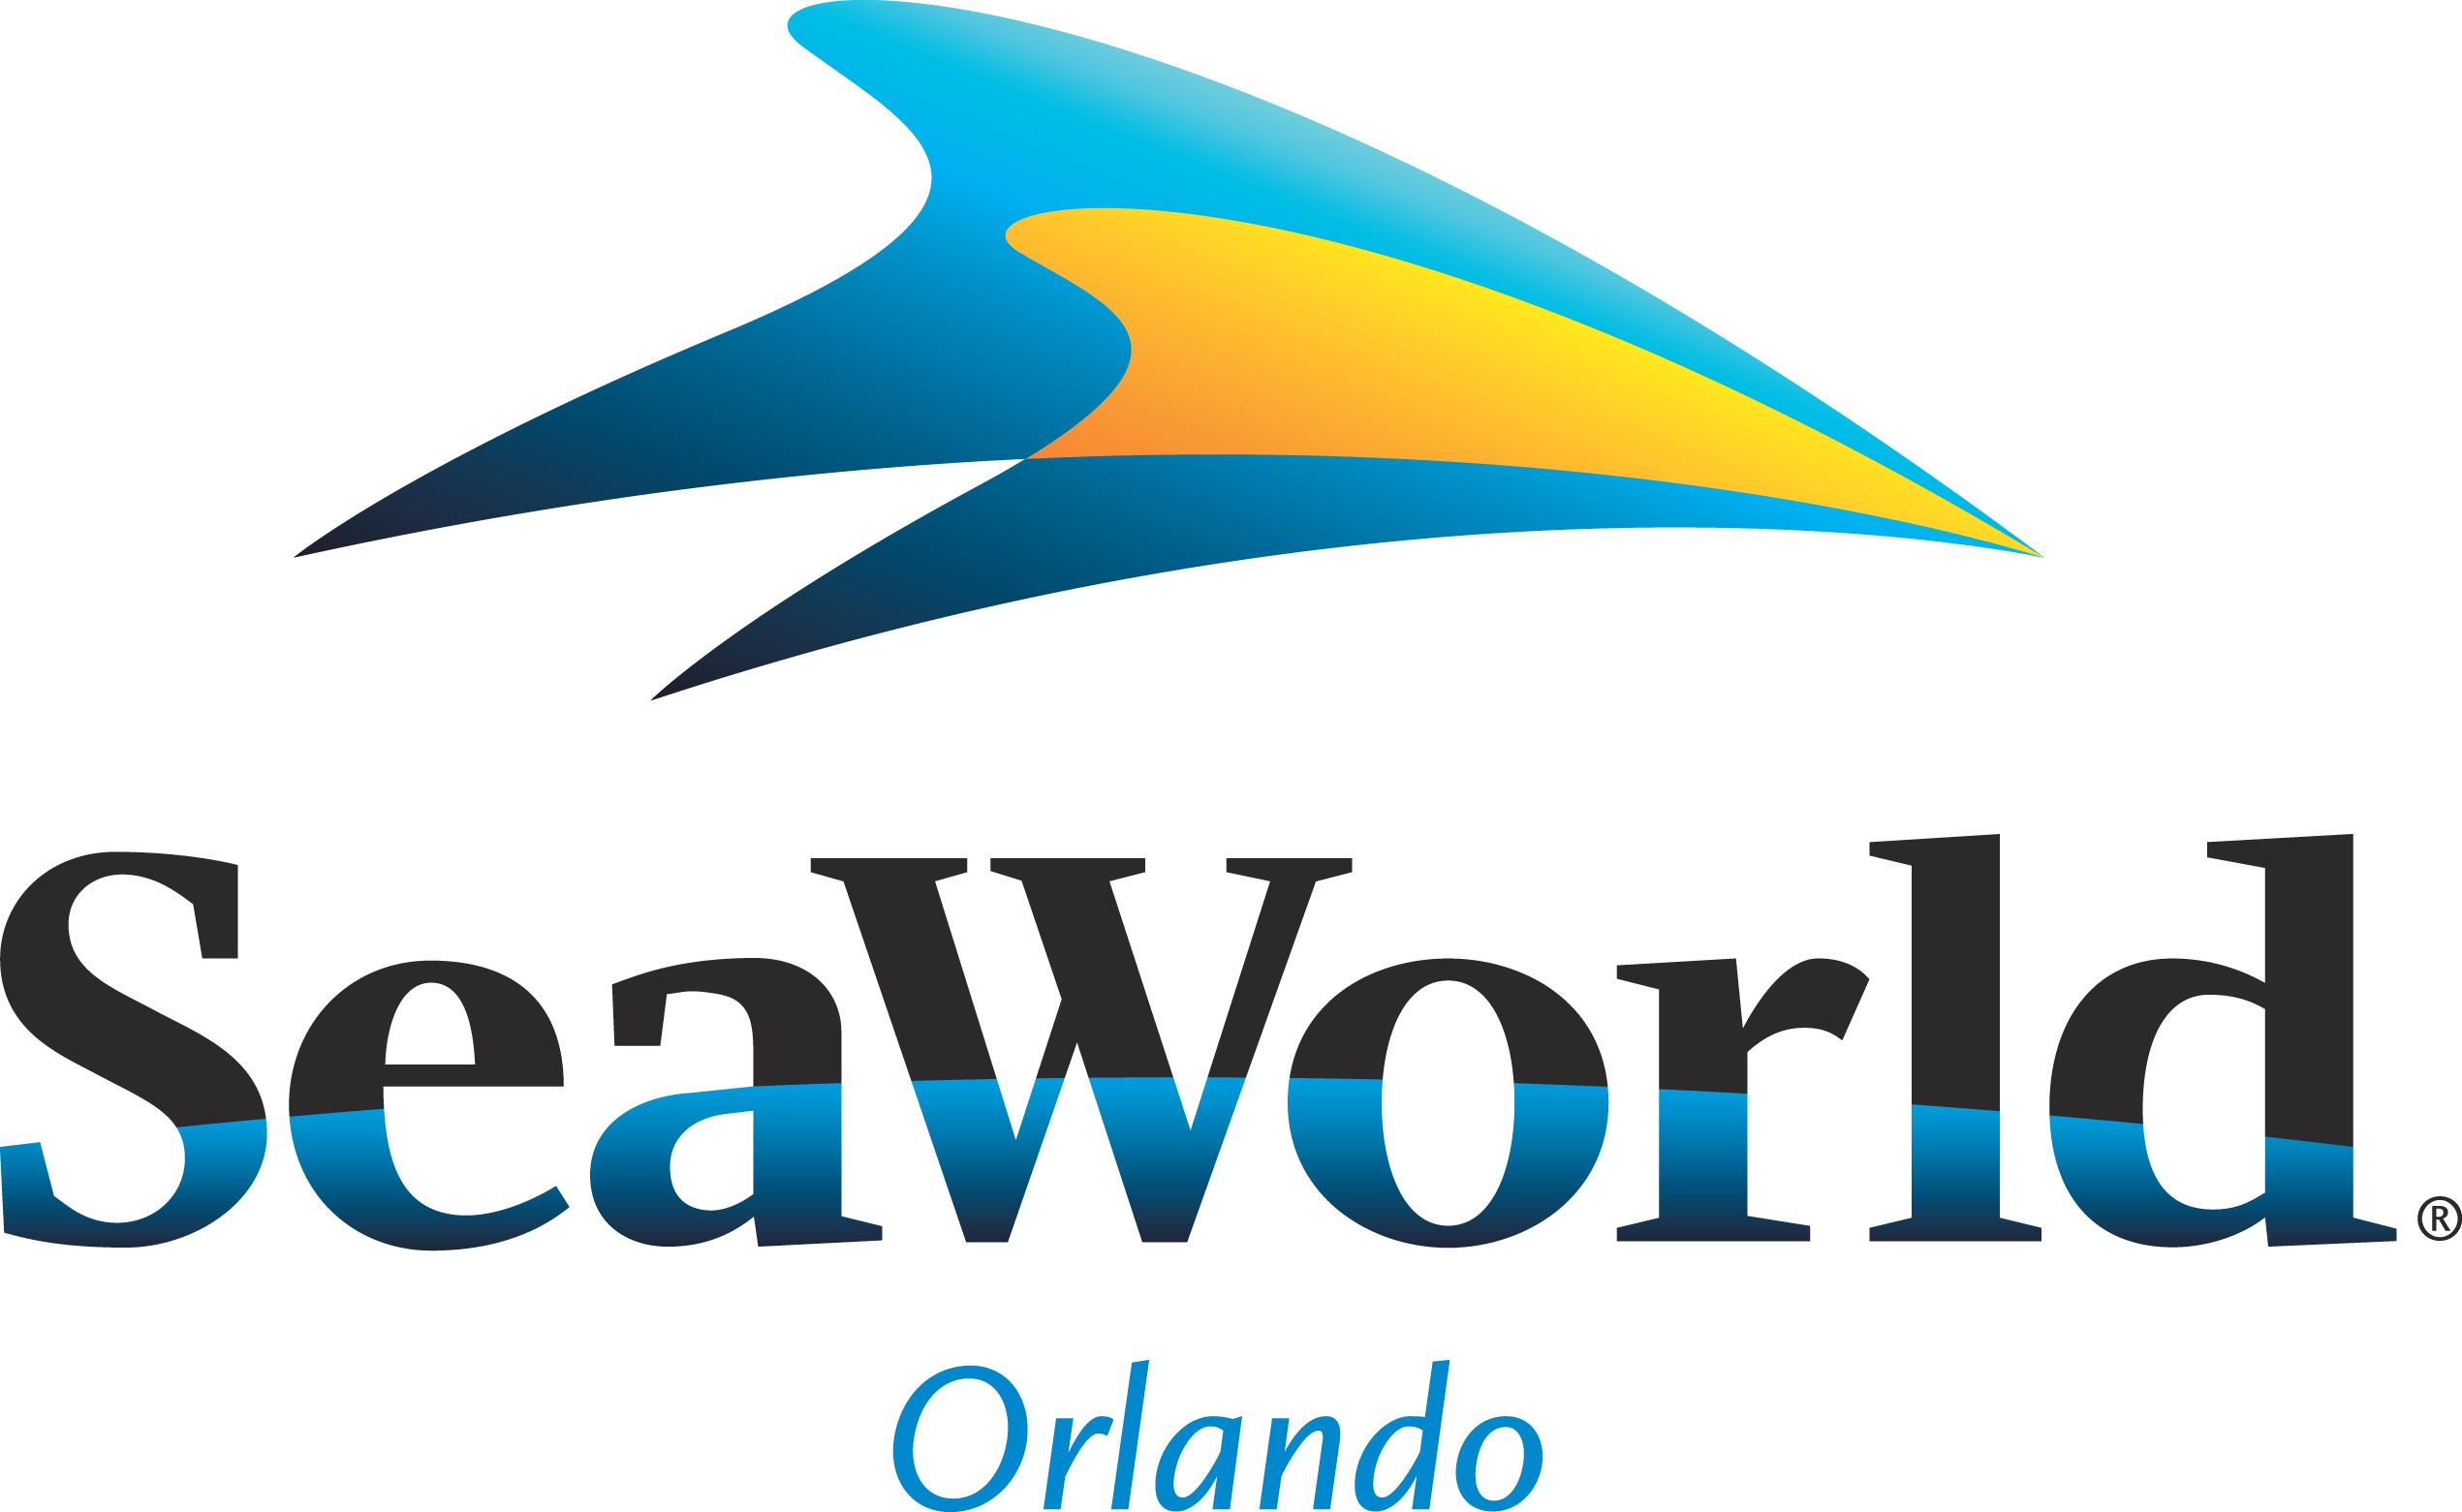 seaworld-orlando-logo